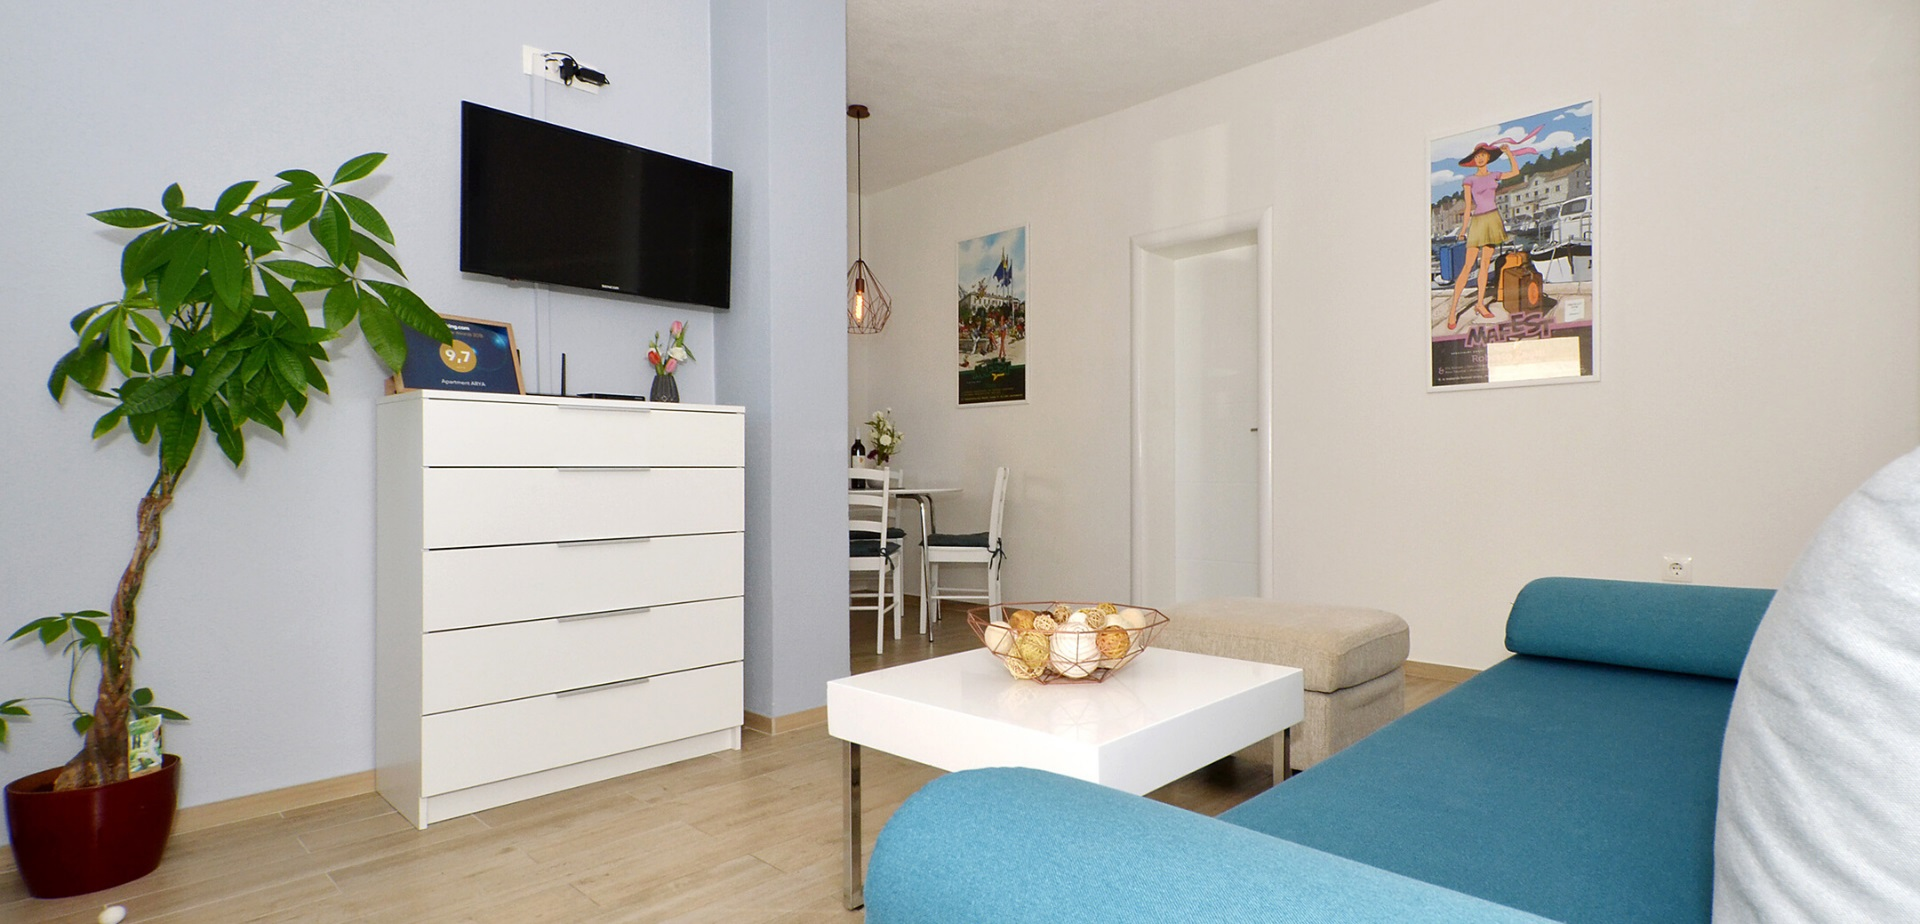 apartment arya makarska accommodation croatia 6